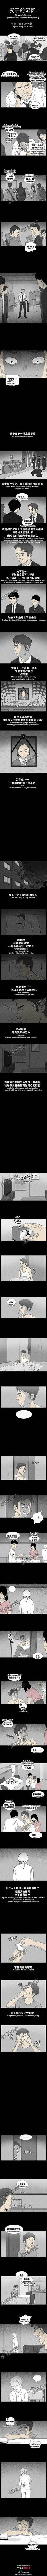 Not from China, but still funny. Wife's Memory, Korean web comic-  http://comic.naver.com/webtoon/detail.nhn?titleId=557672&no=29